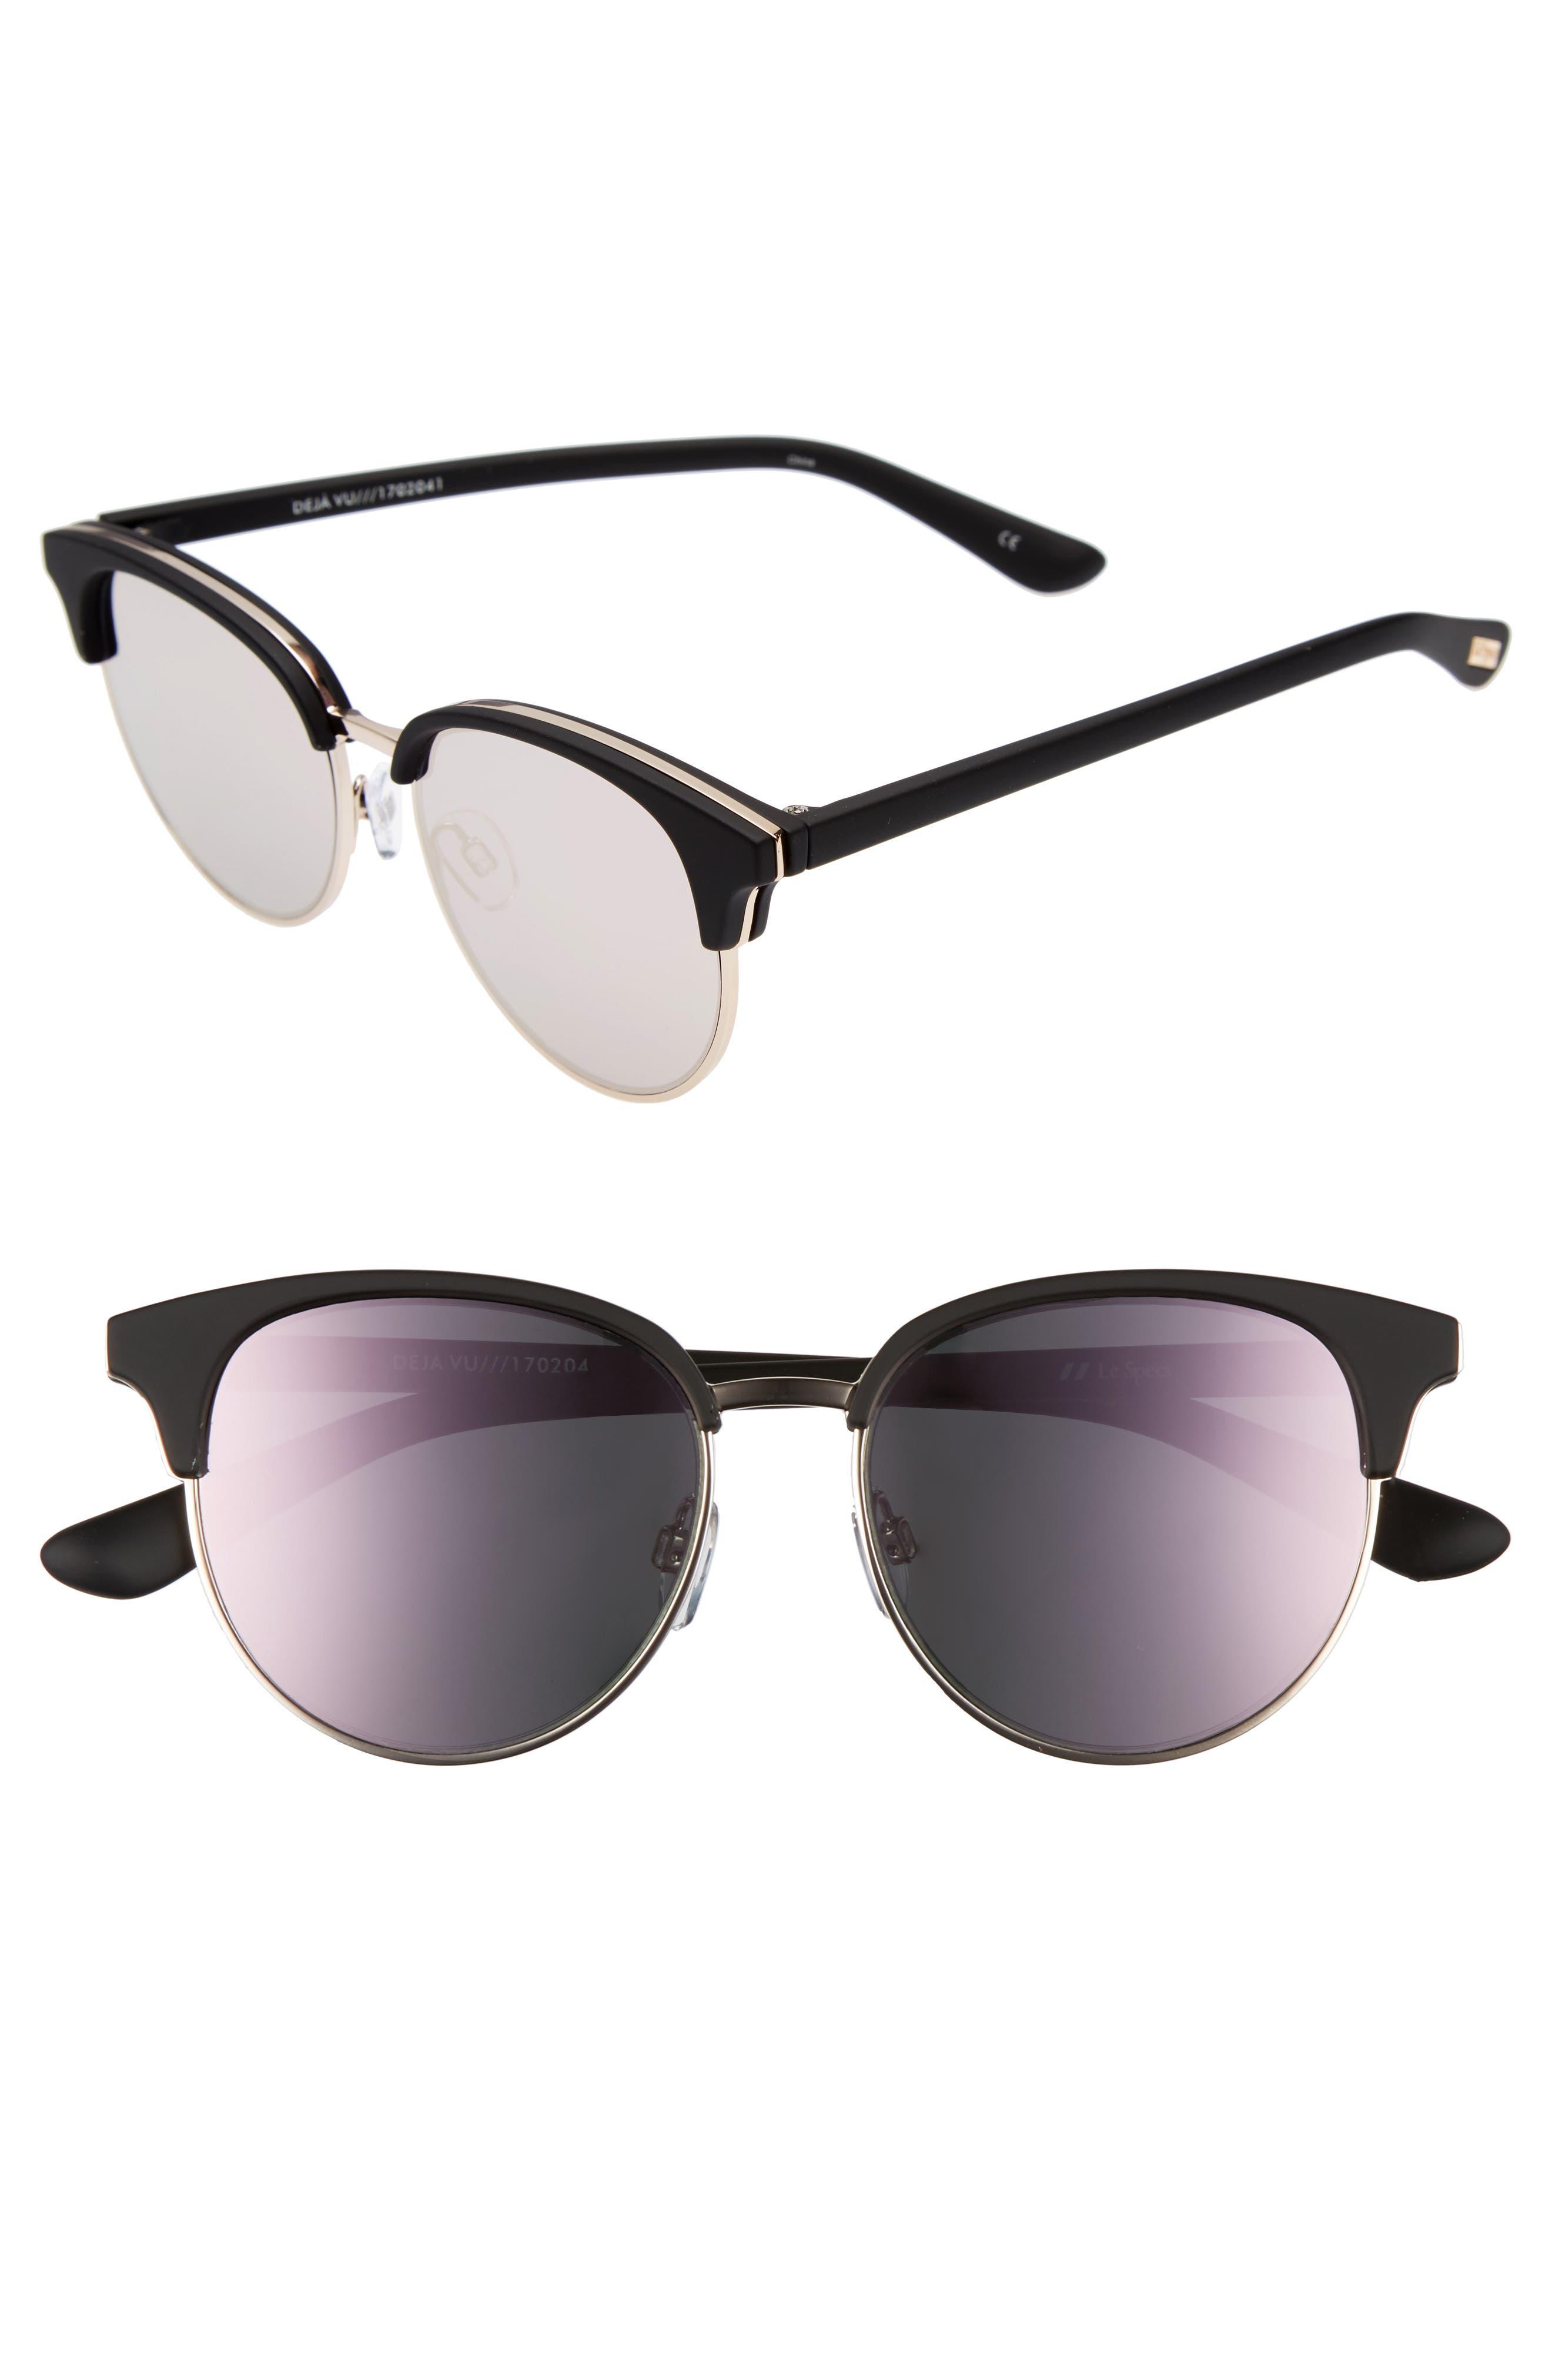 Deja Vu 51mm Round Sunglasses,                             Main thumbnail 1, color,                             001